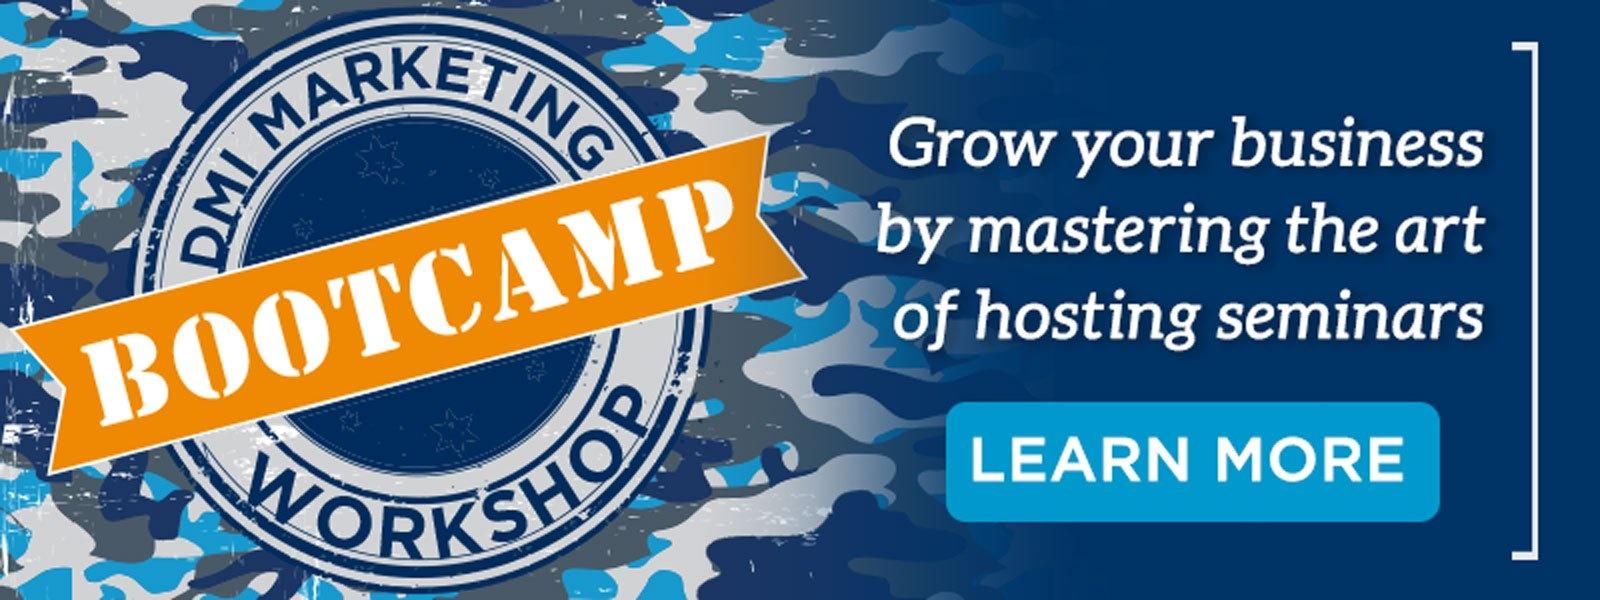 DMI Marketing Workshop Bootcamp